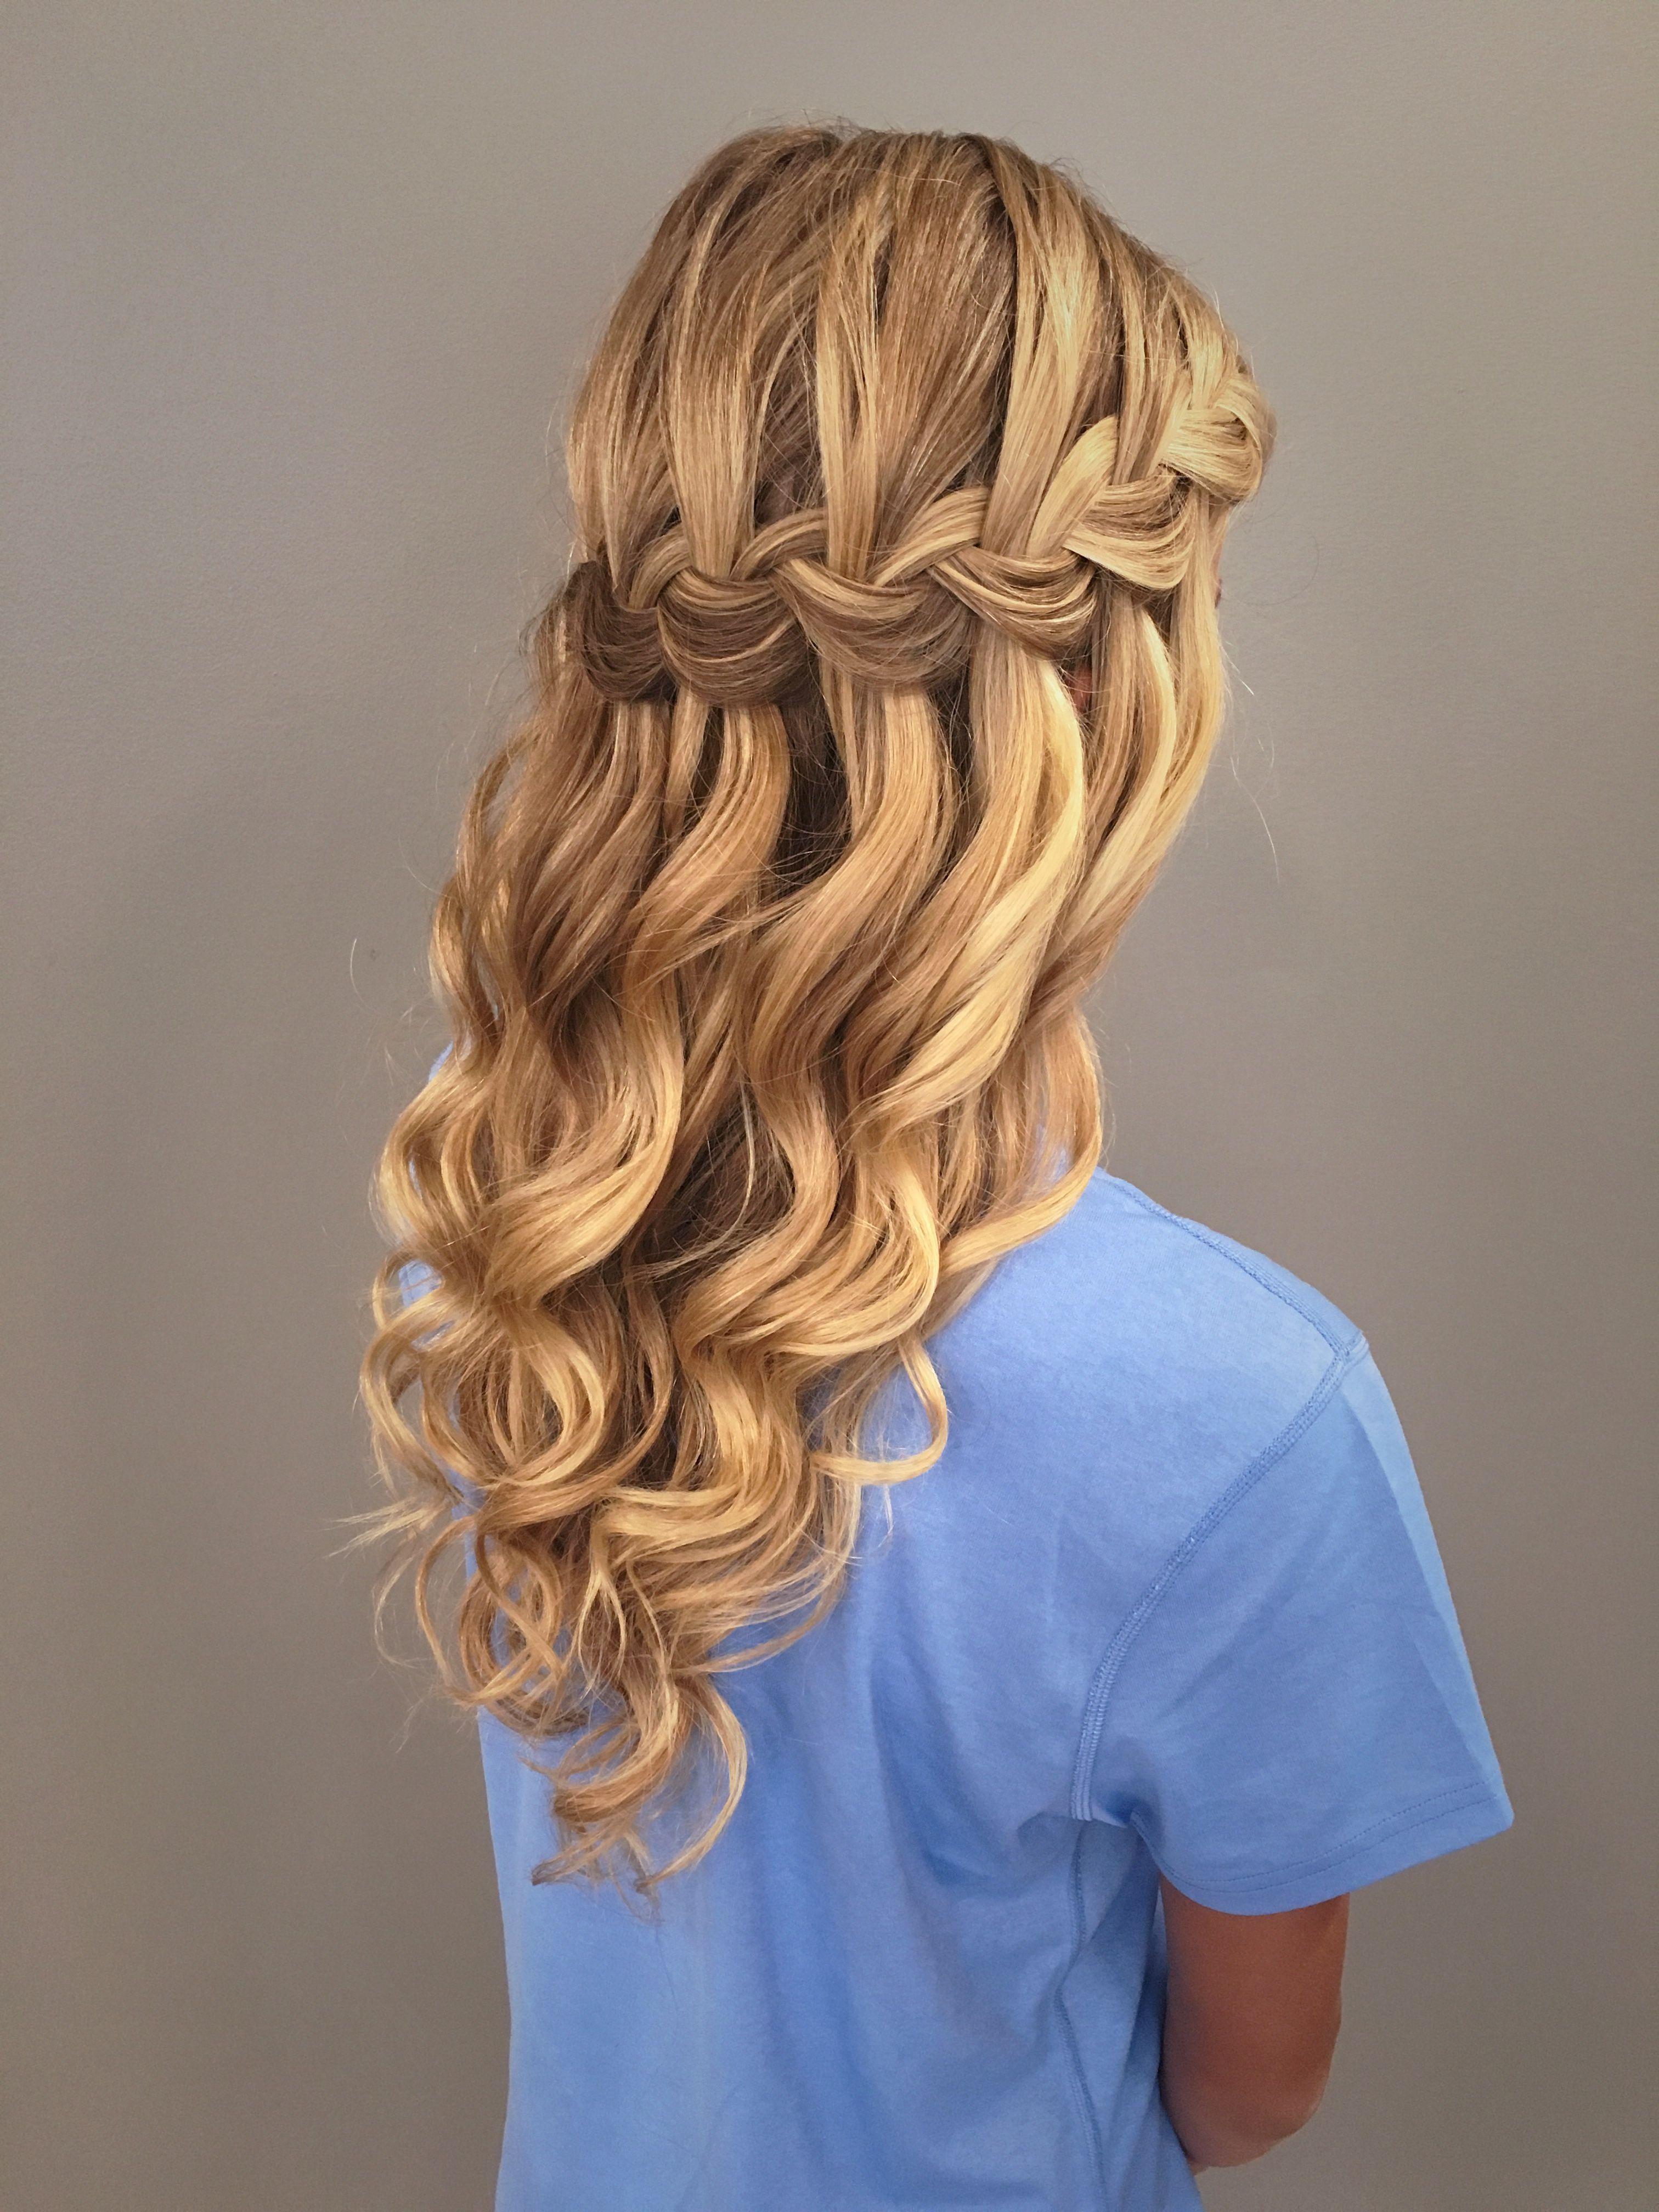 waterfall braid with mermaid waves! great bridal, prom, or